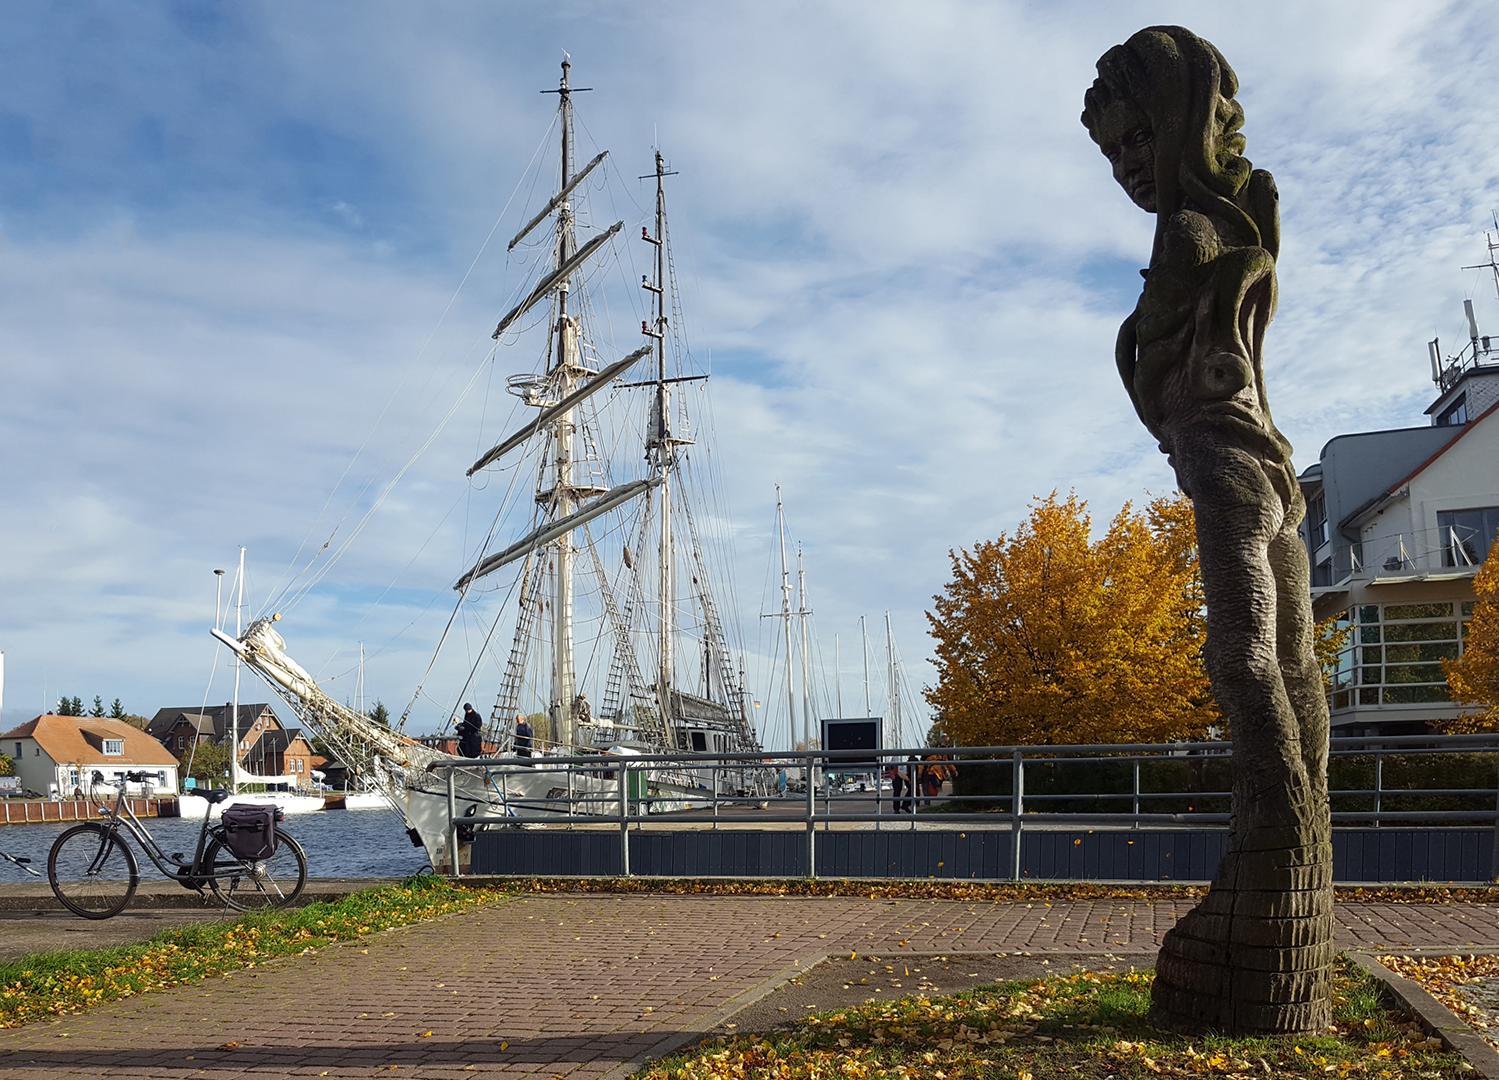 Segelschulschiff GREIF in Greifswald-Wieck